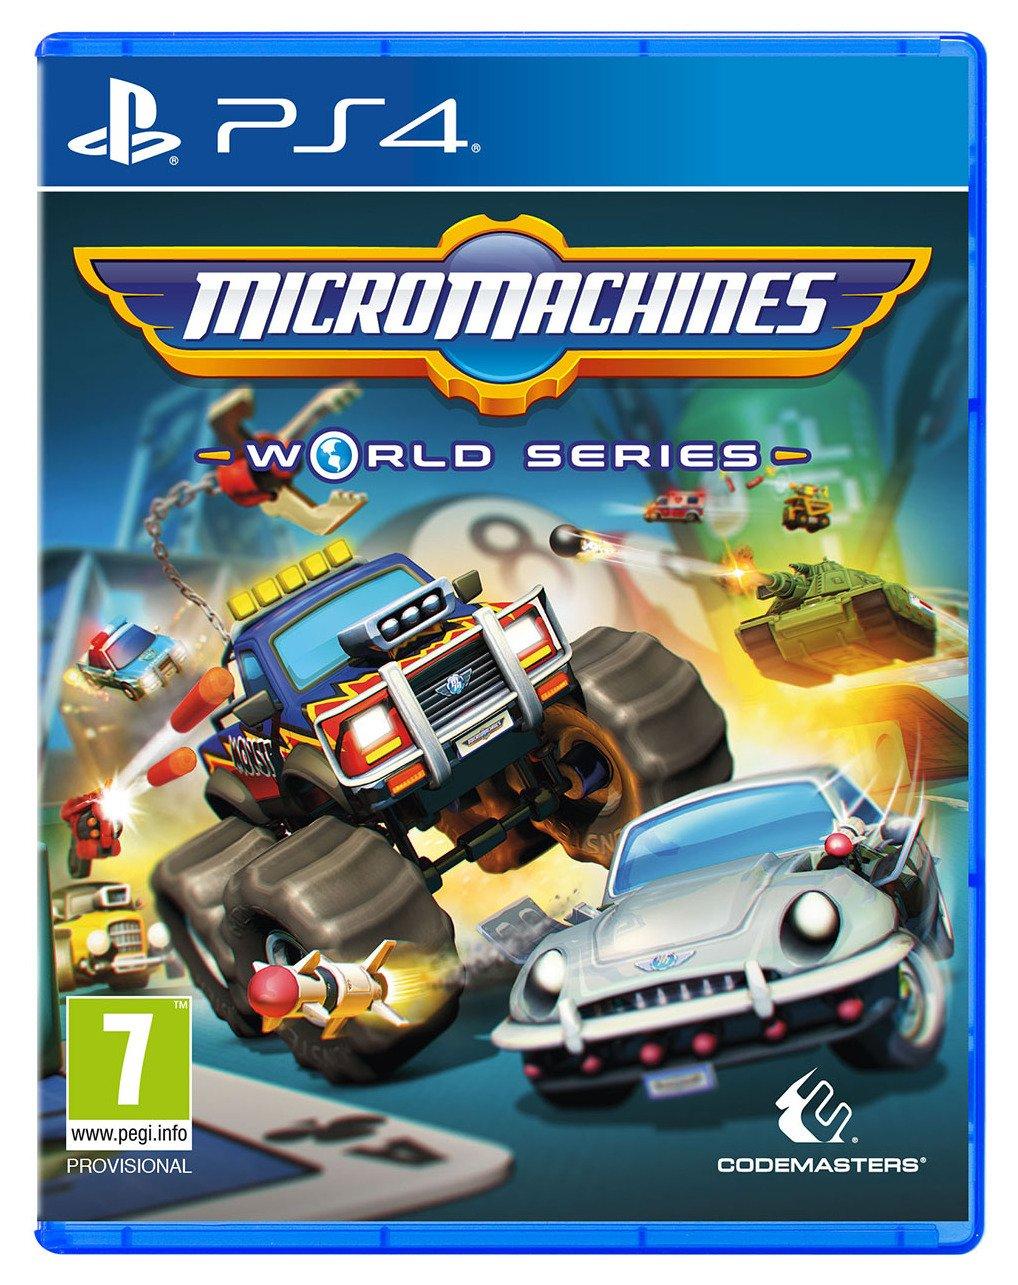 Micro Machines: World Series PS4 Game.